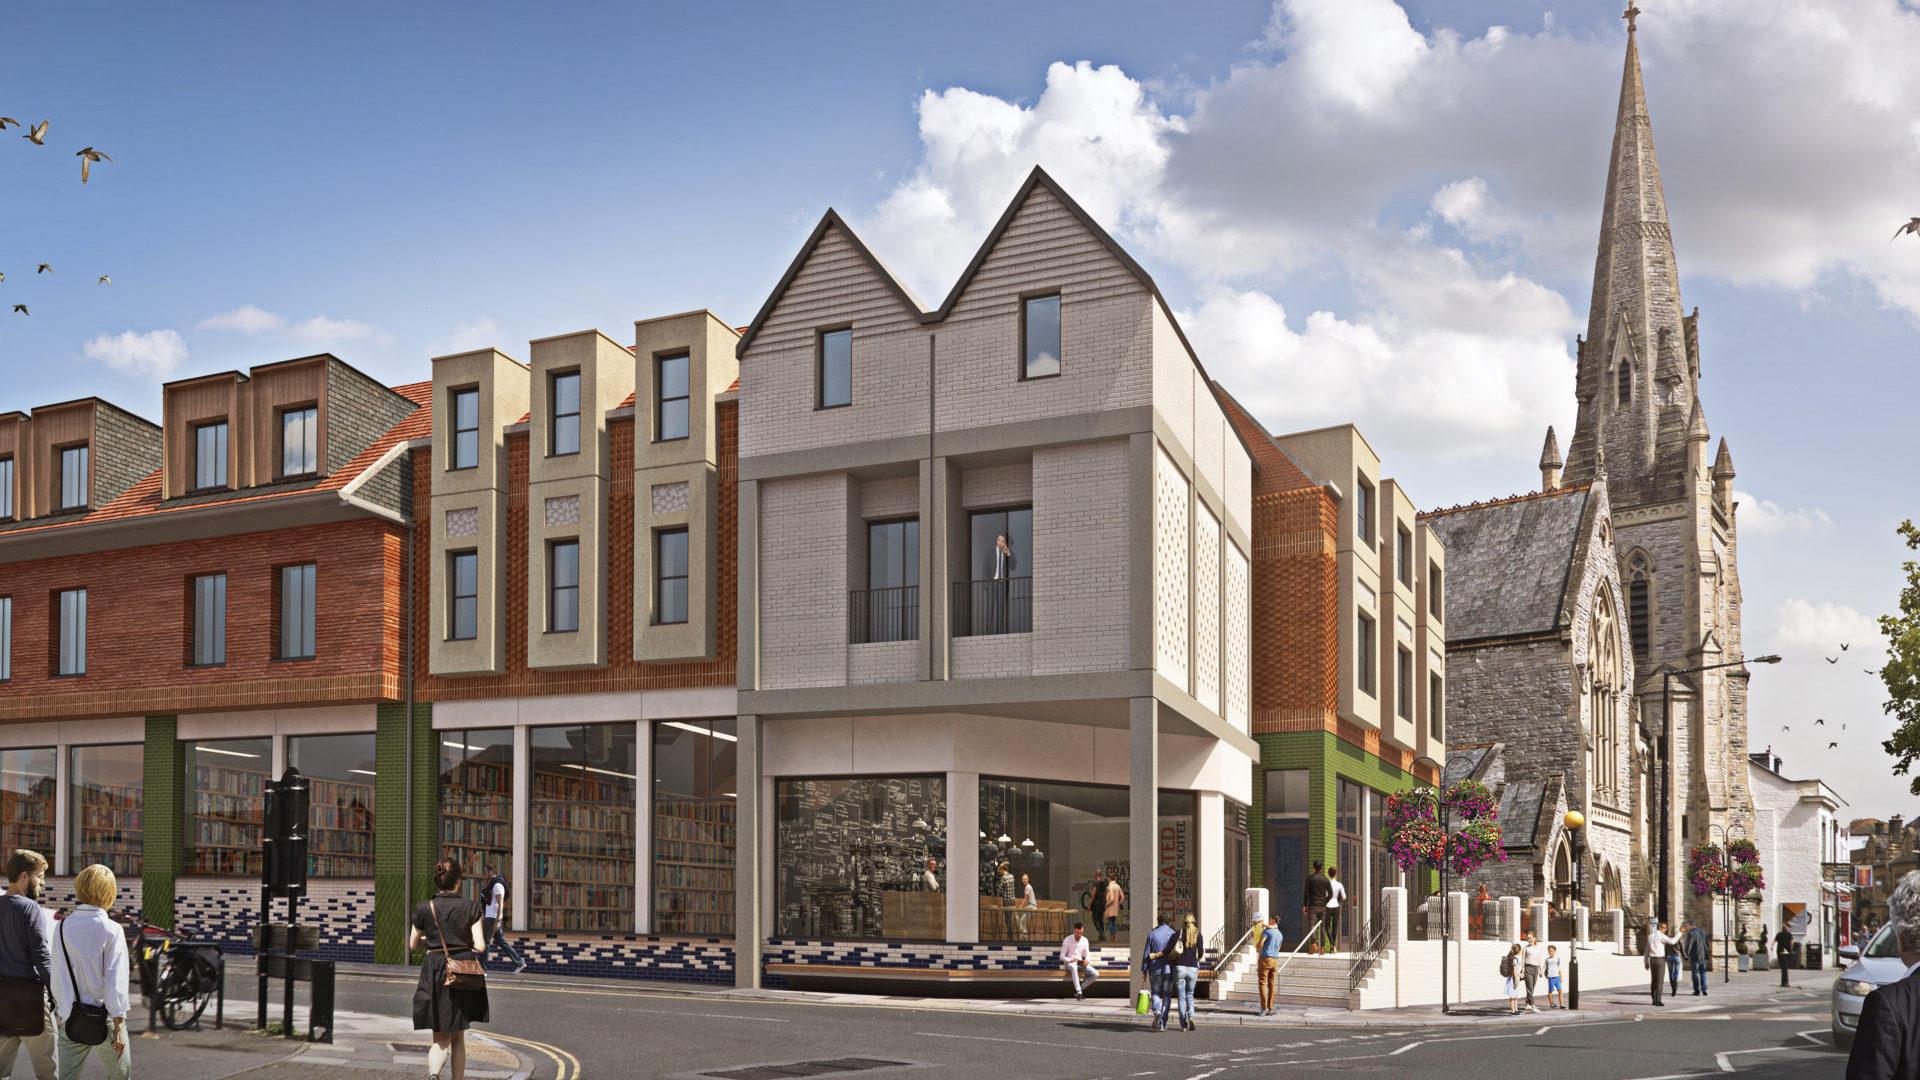 CGI animated photo of a proposed development in Salisbury